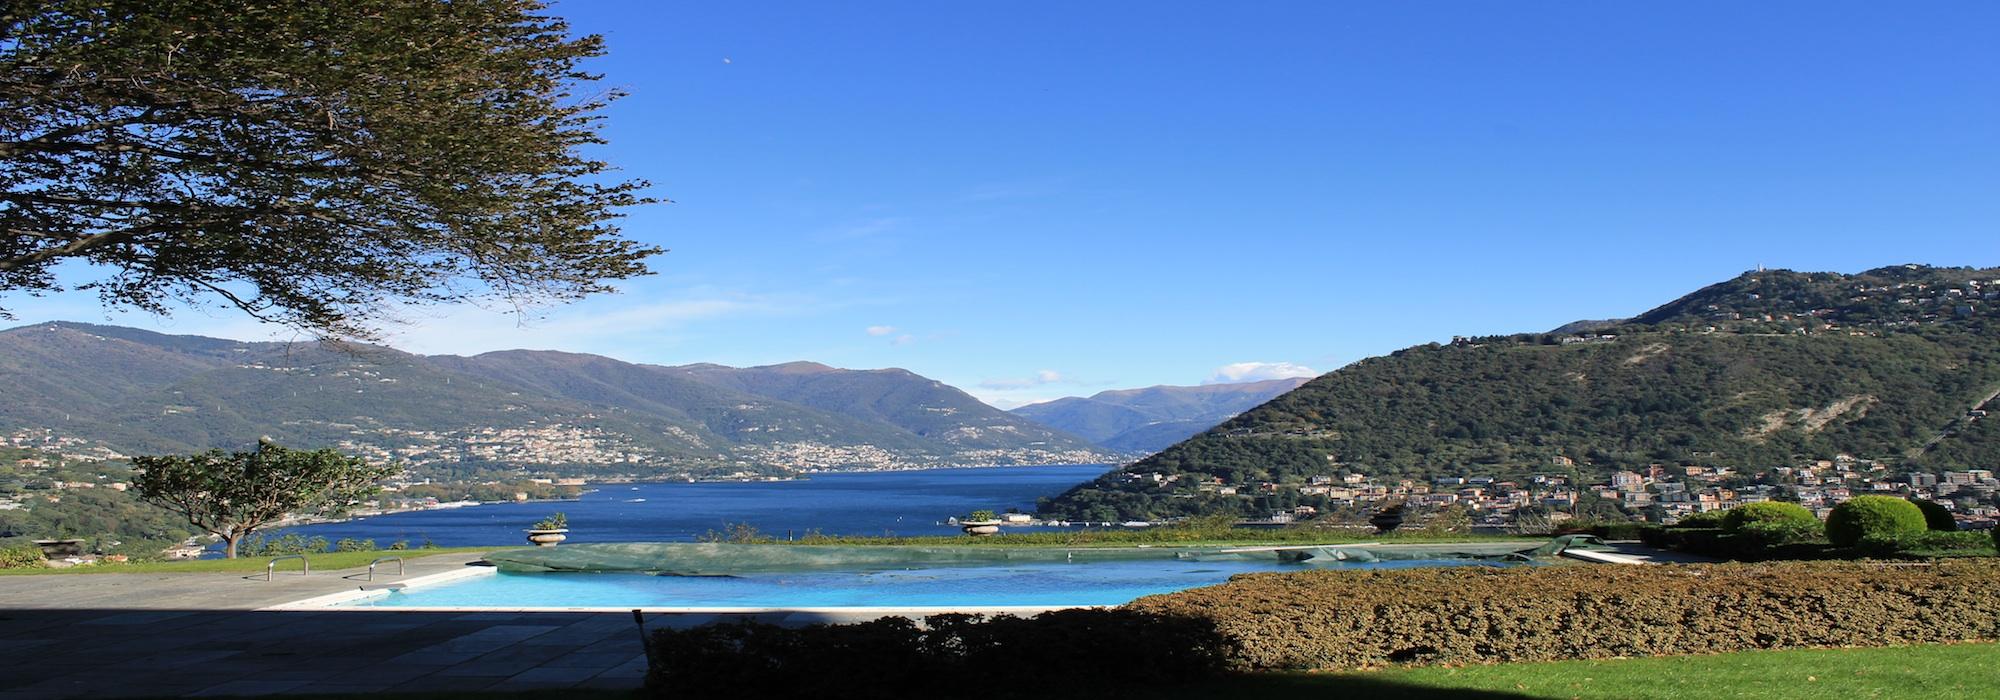 Lake Como Luxury Apartment with Lake View